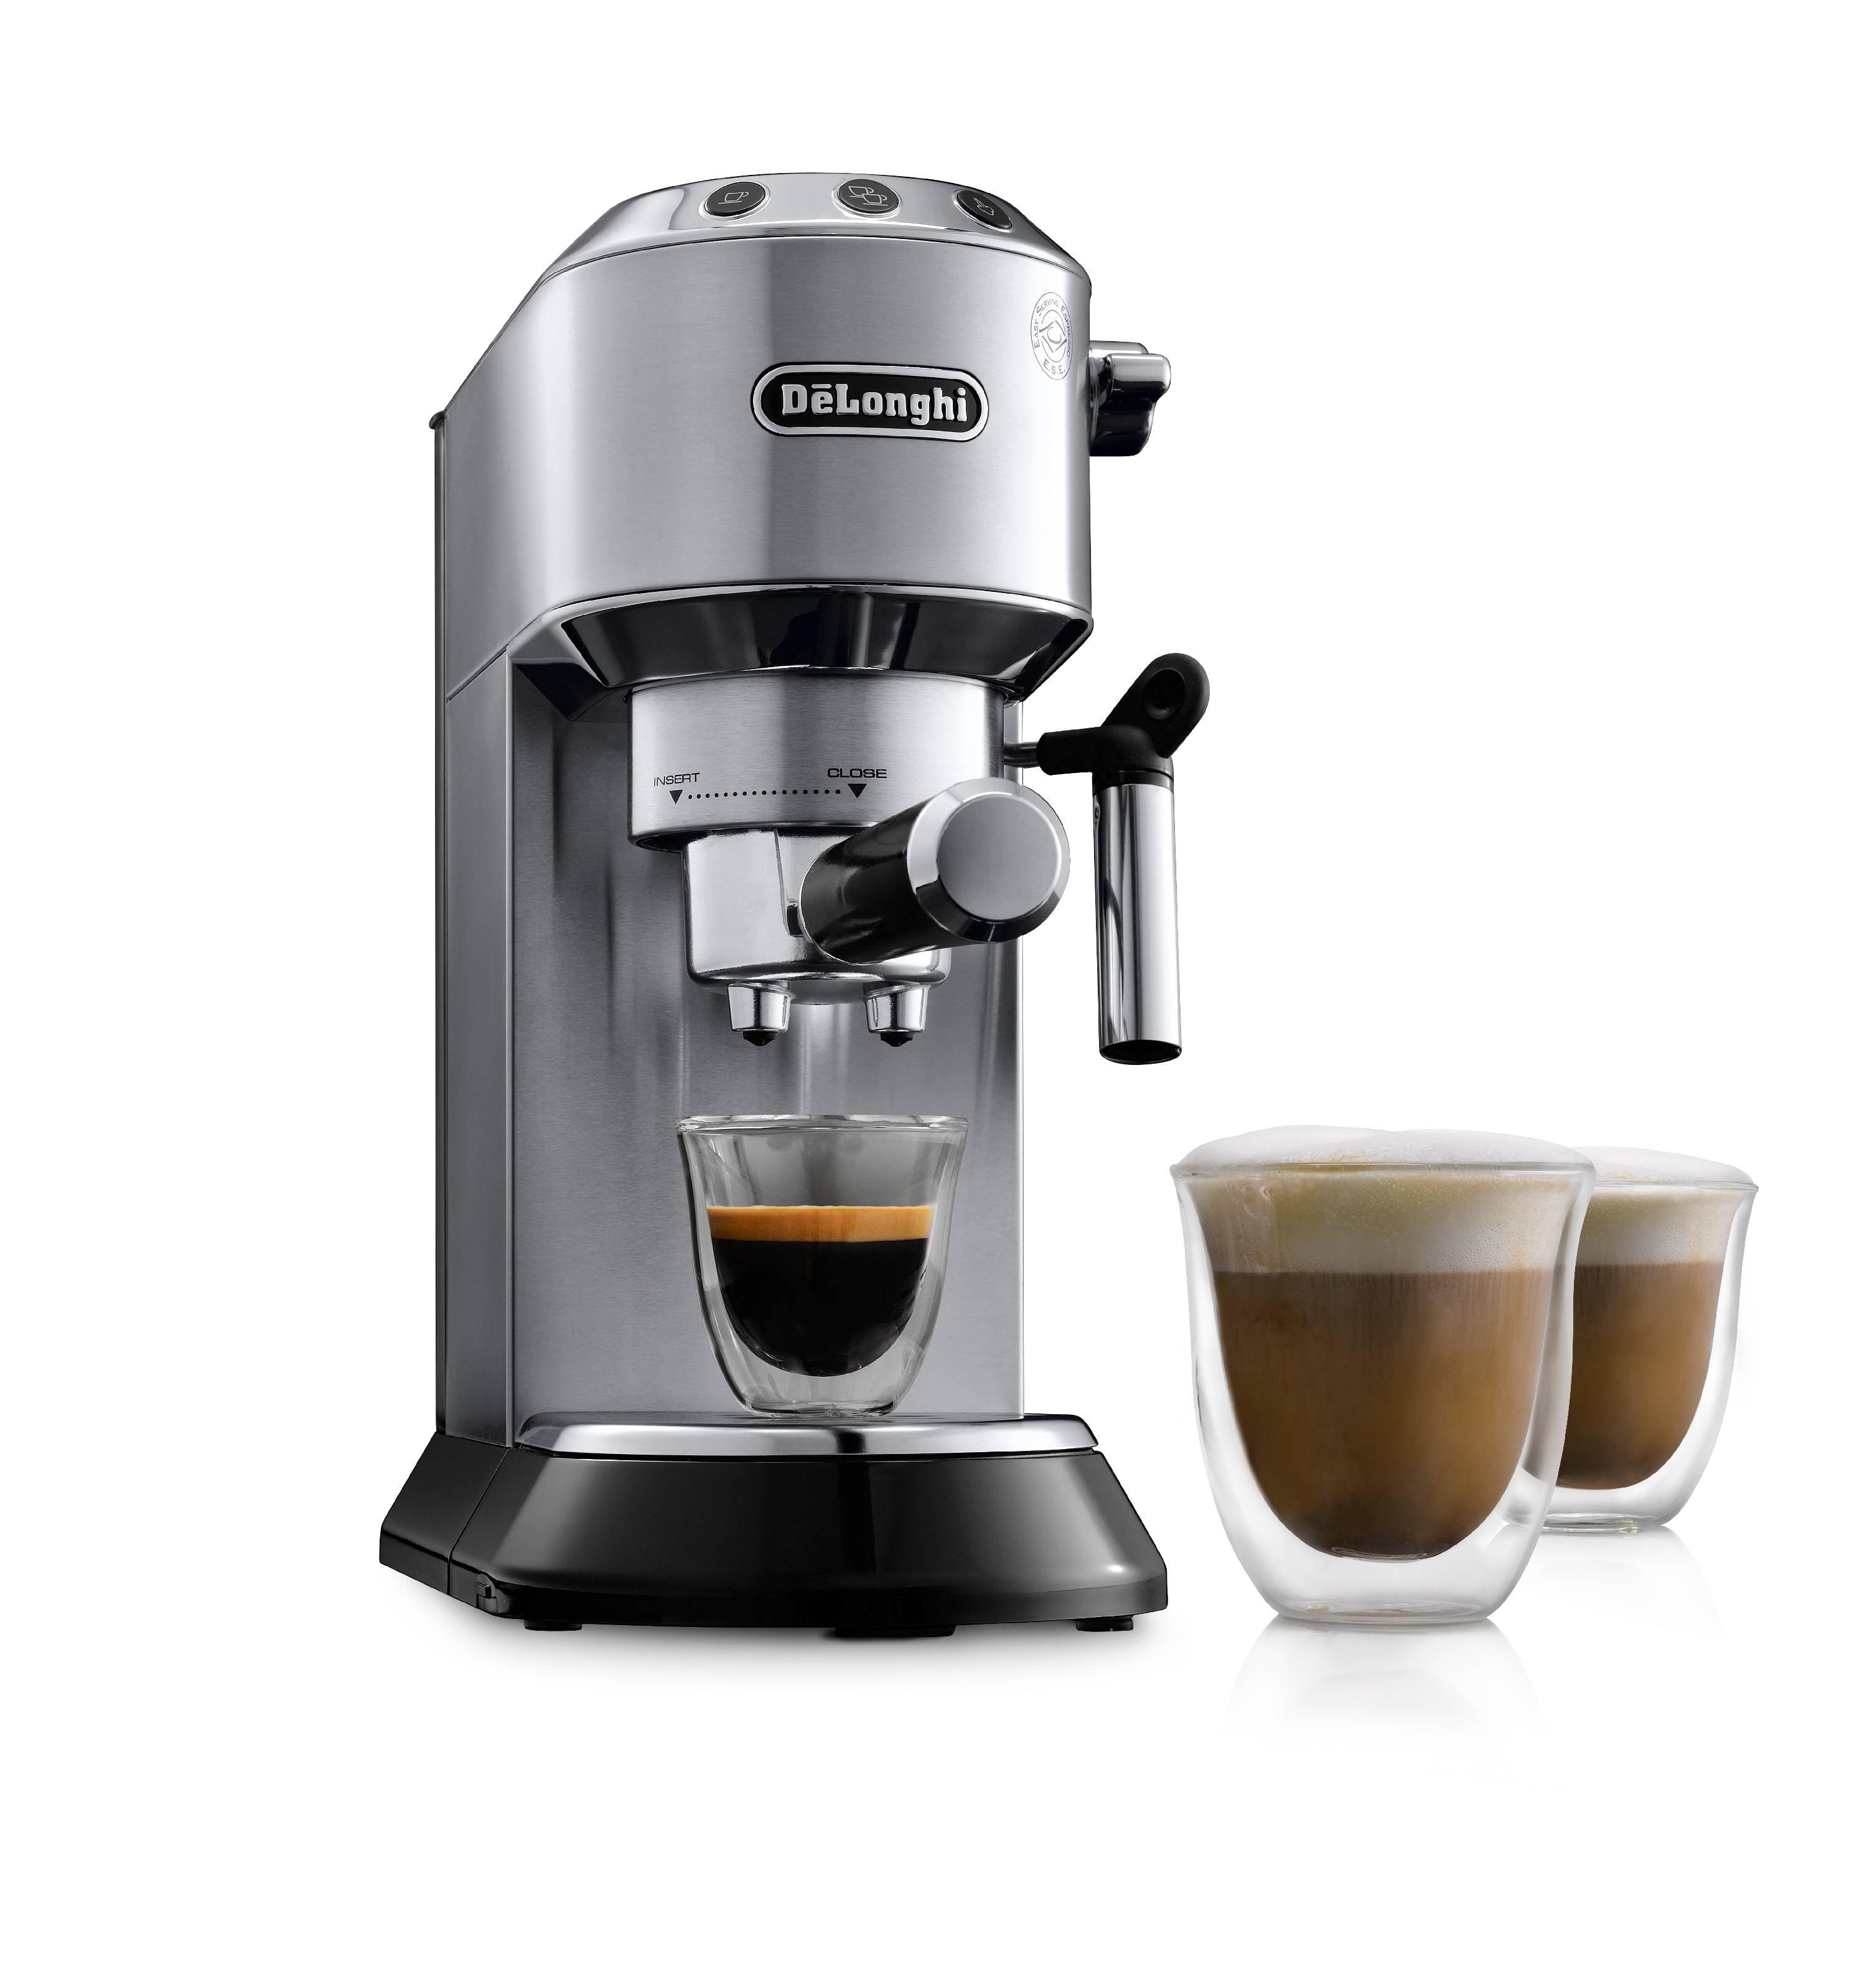 Best Espresso Machines - DeLonghi DEDICA Pump Espresso Machine - Silver EC680M Review